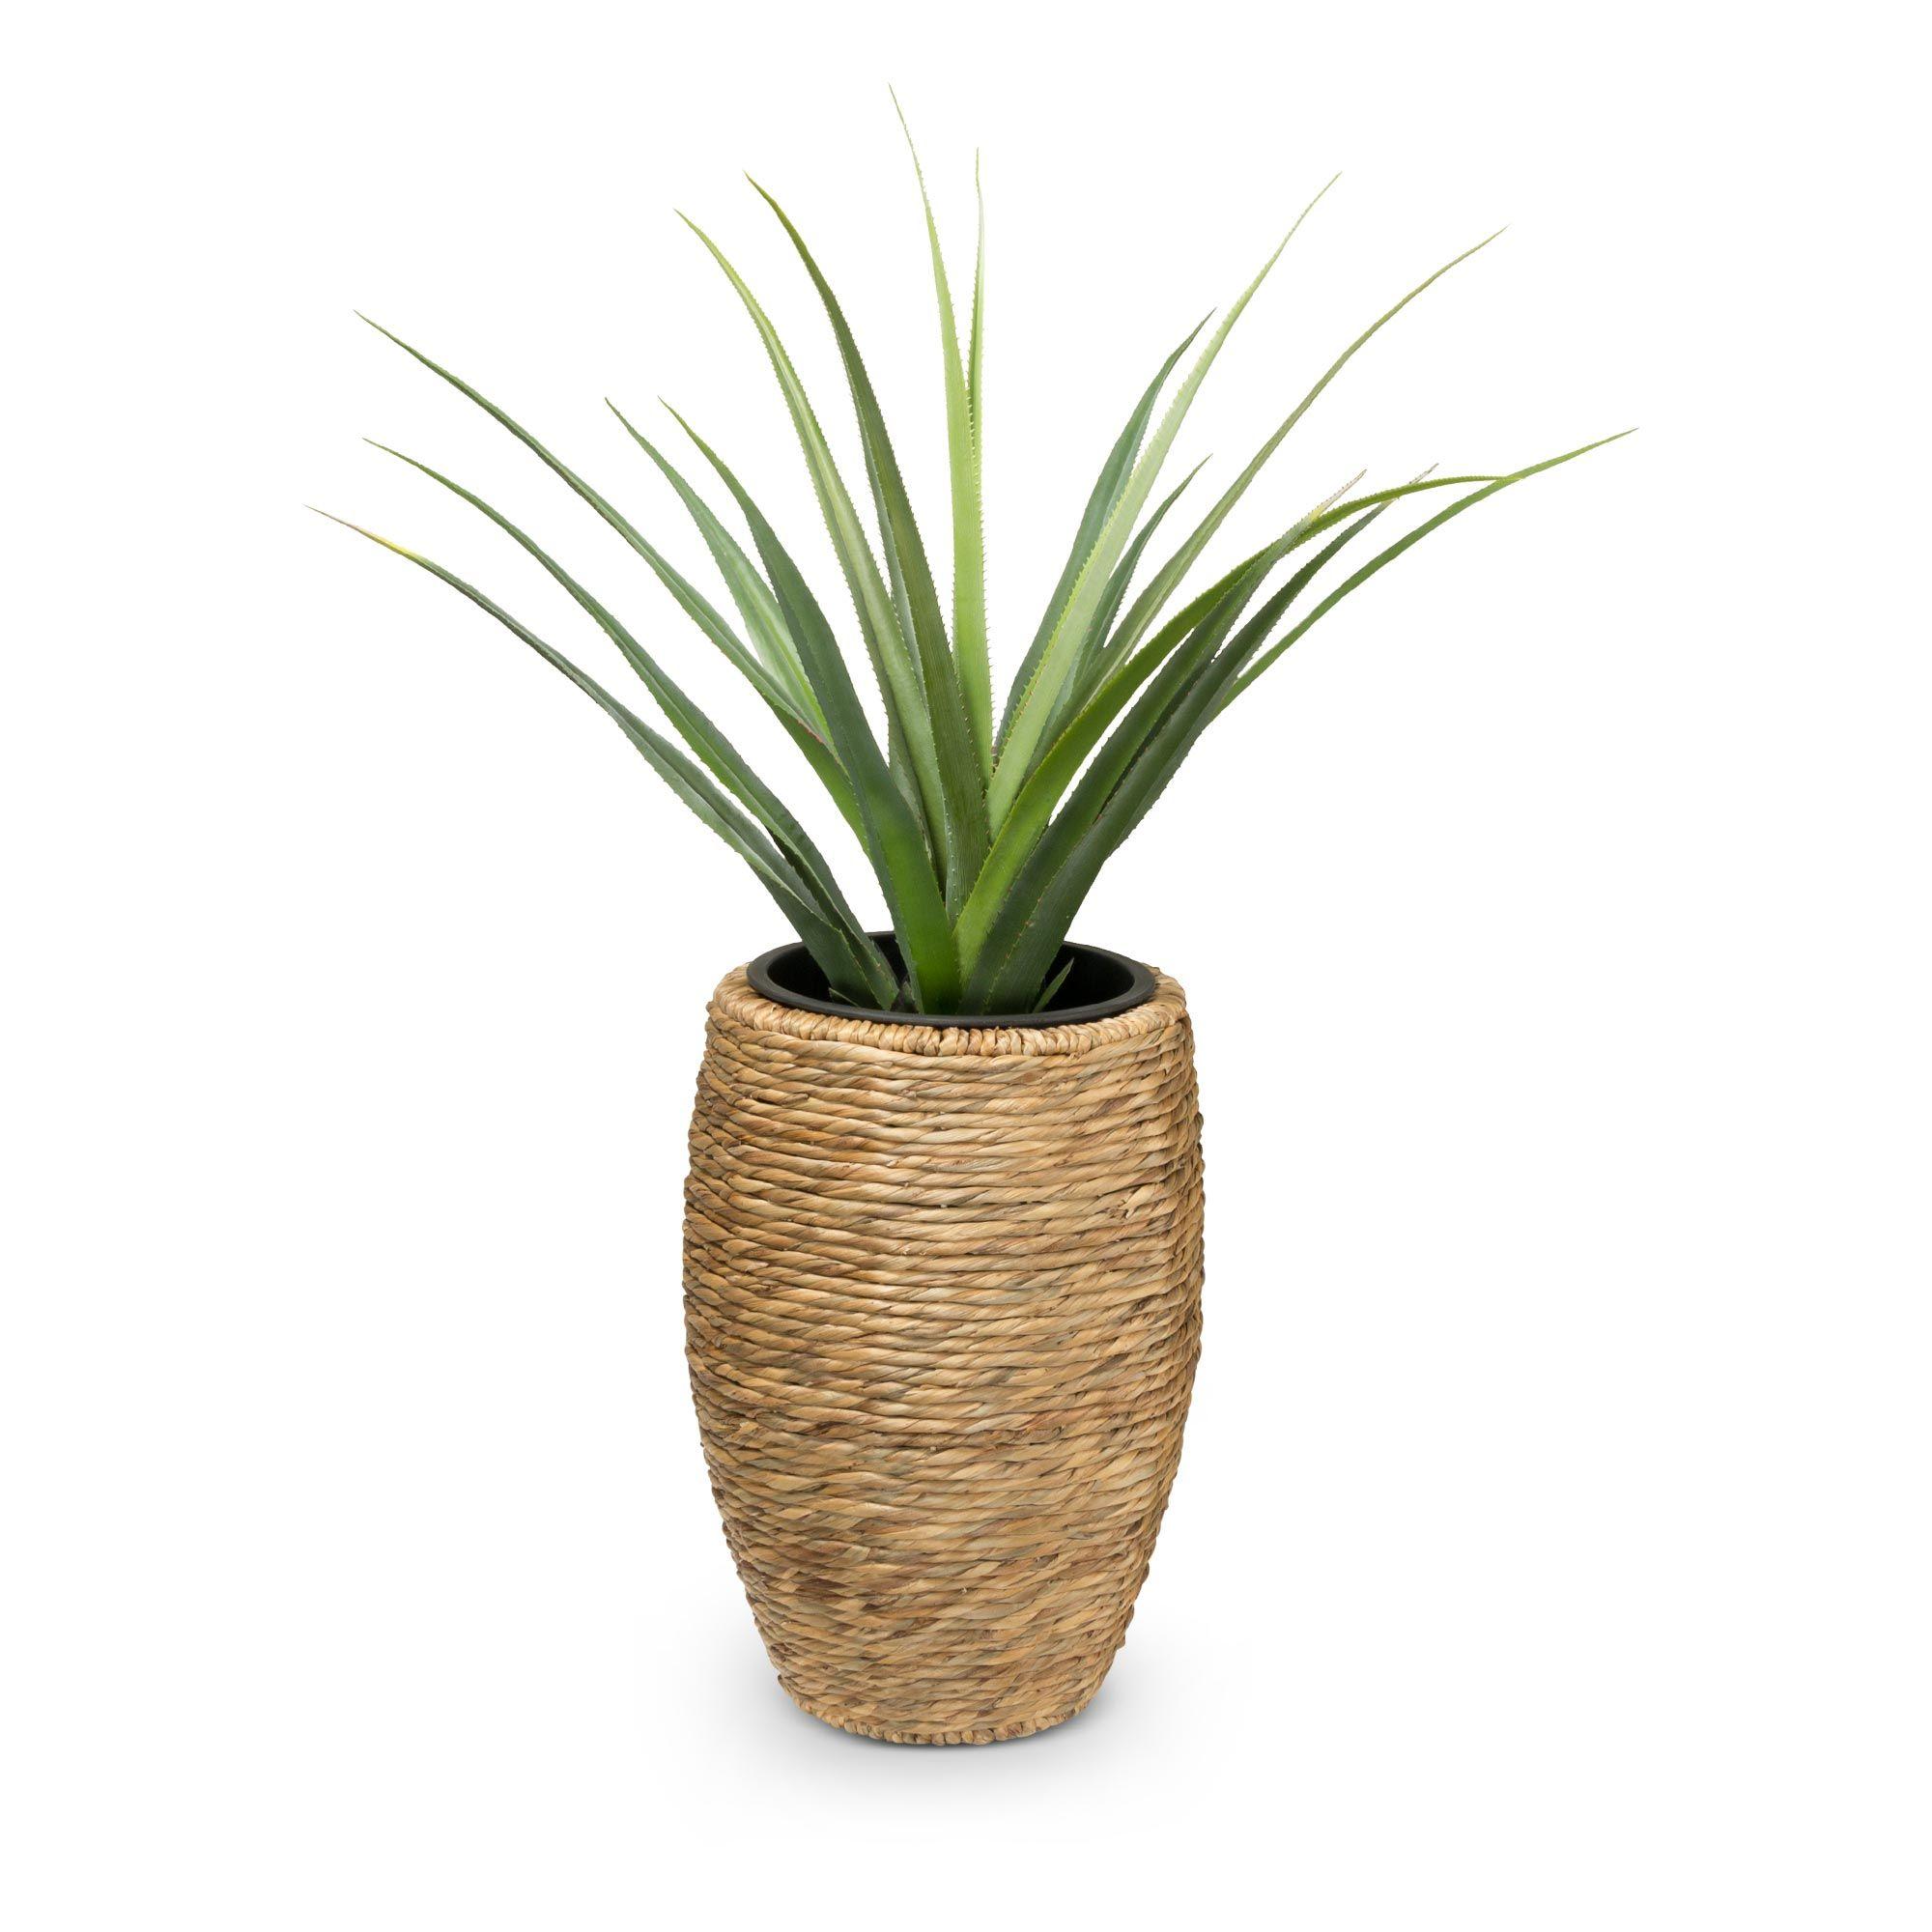 3er Set Pflanzkubel Ciga Wasserhyazinthe Pflanzkubel Pflanzen